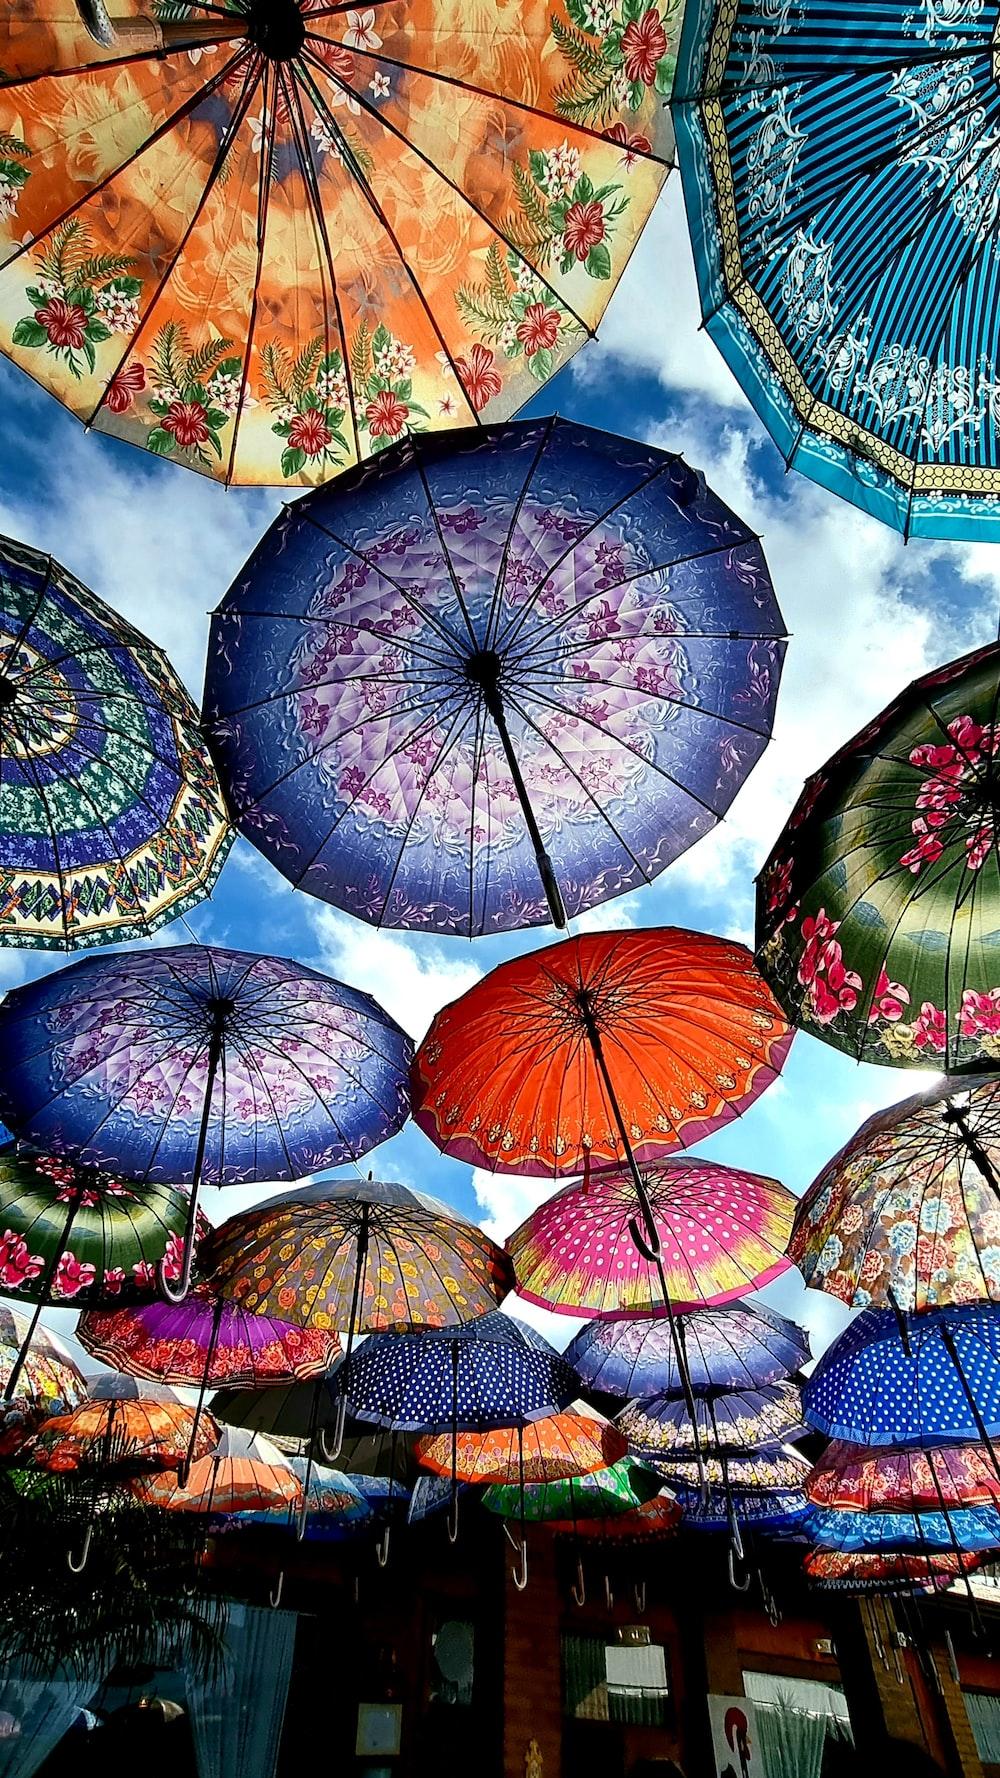 assorted umbrellas under blue sky during daytime